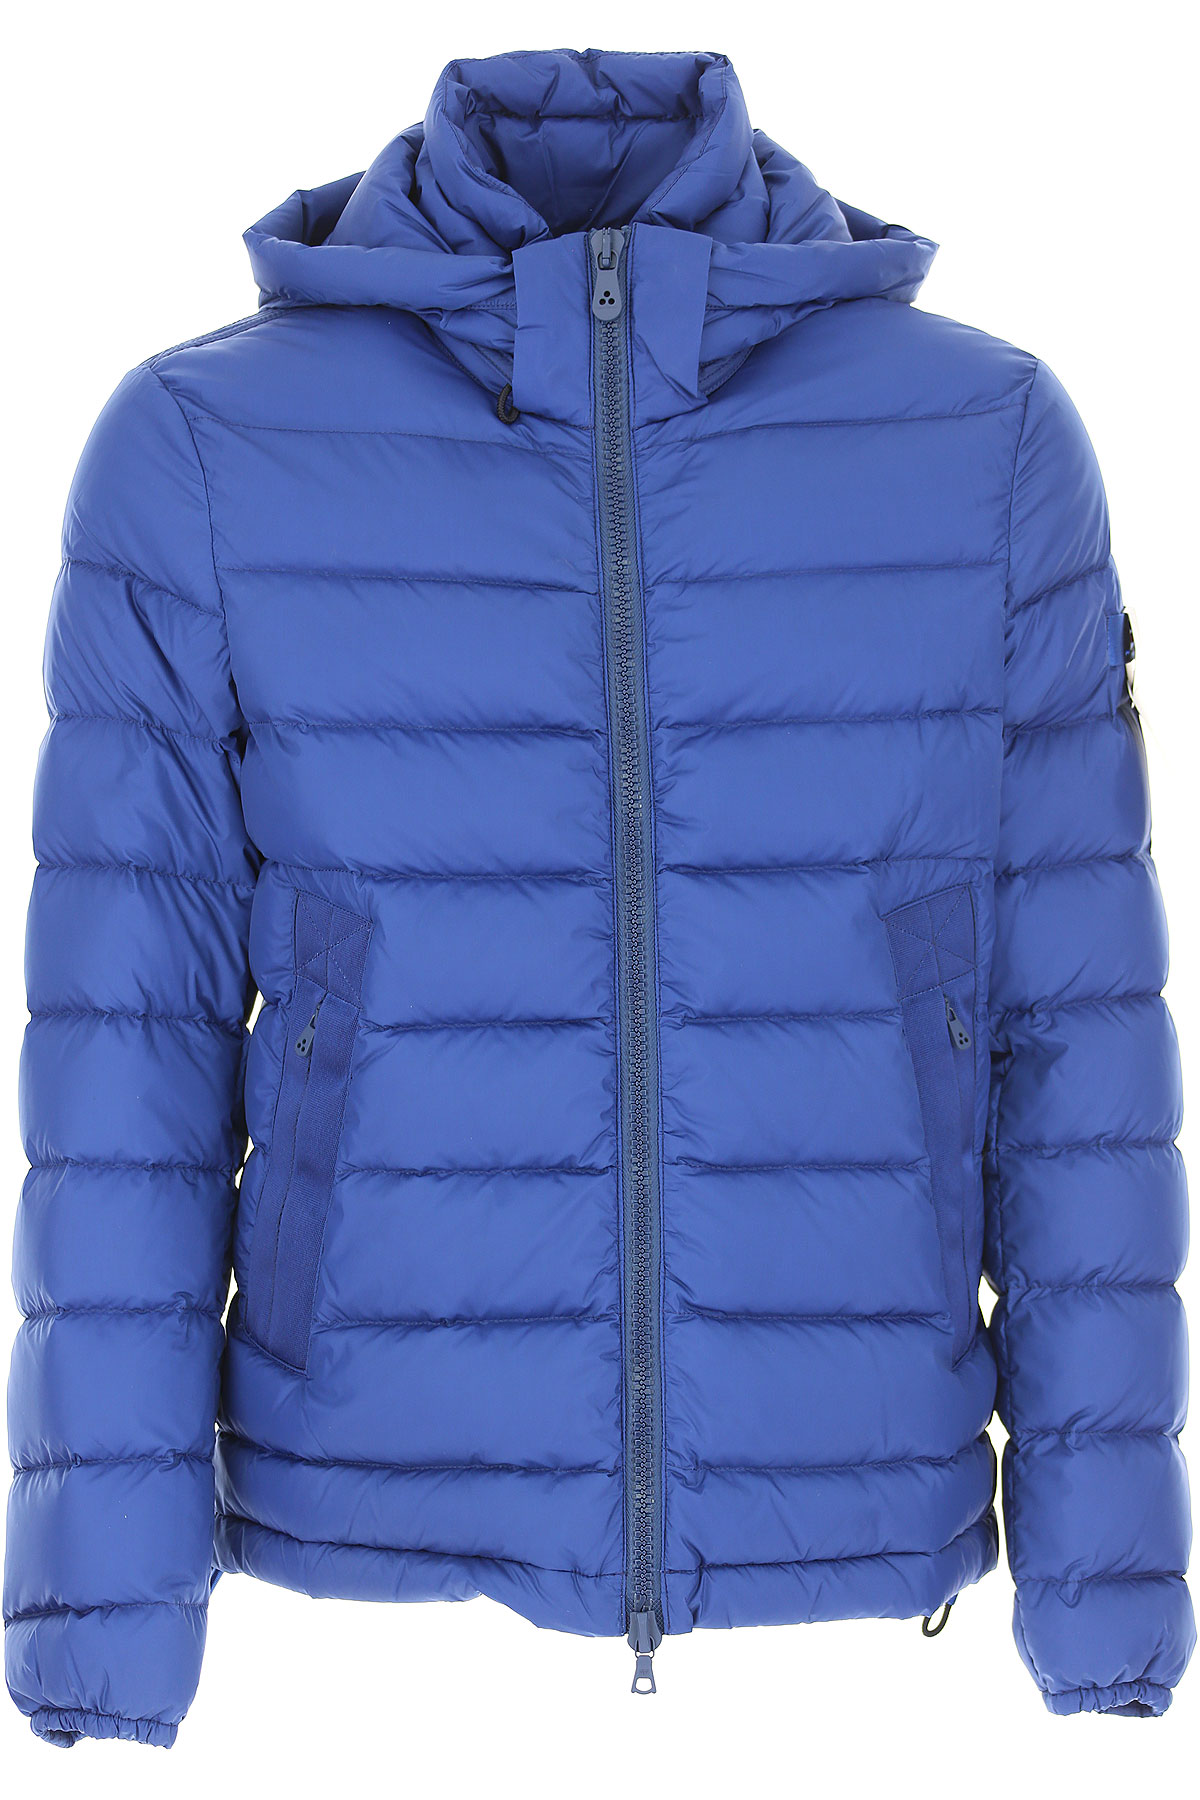 Image of Peuterey Down Jacket for Men, Puffer Ski Jacket, Bluette, polyamide, 2017, L M S XL